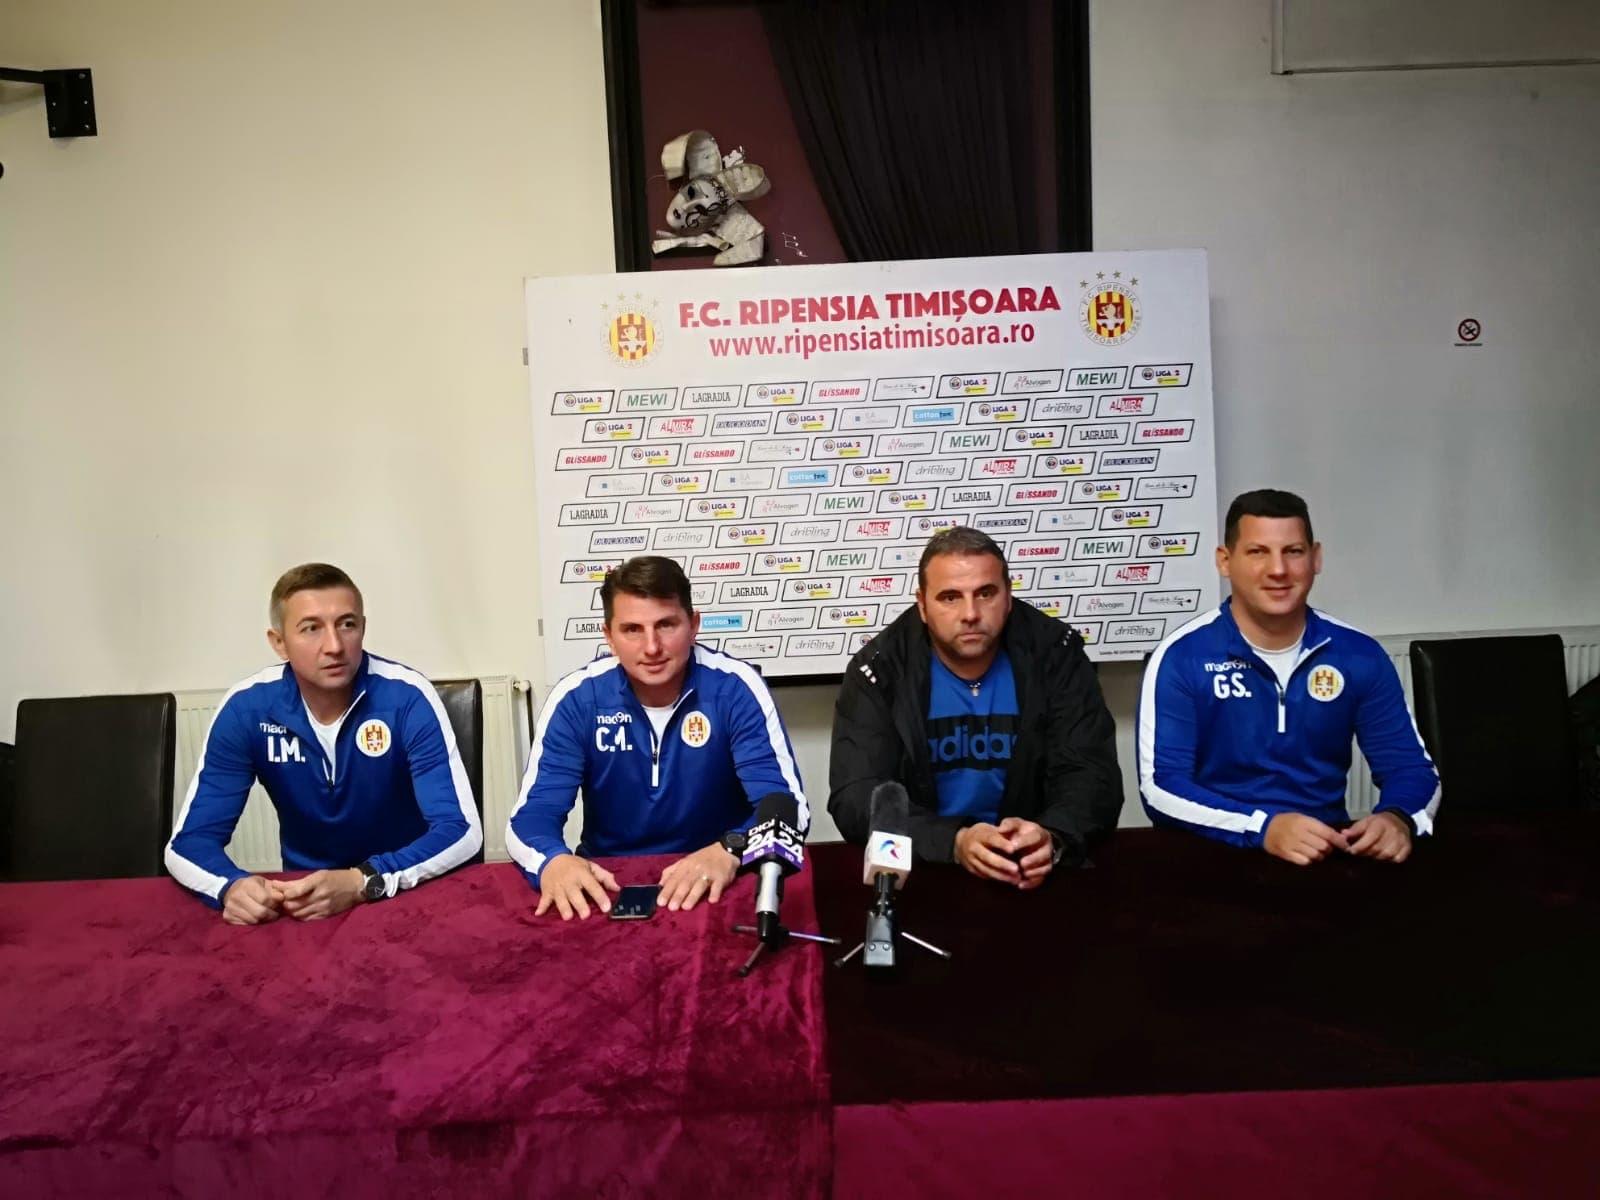 De la stânga, la dreapta: Iulian Muntean (secund), Călin Mada (secund), Alexandru Pelici (principal), Giury Stoianov (antrenor cu portarii)